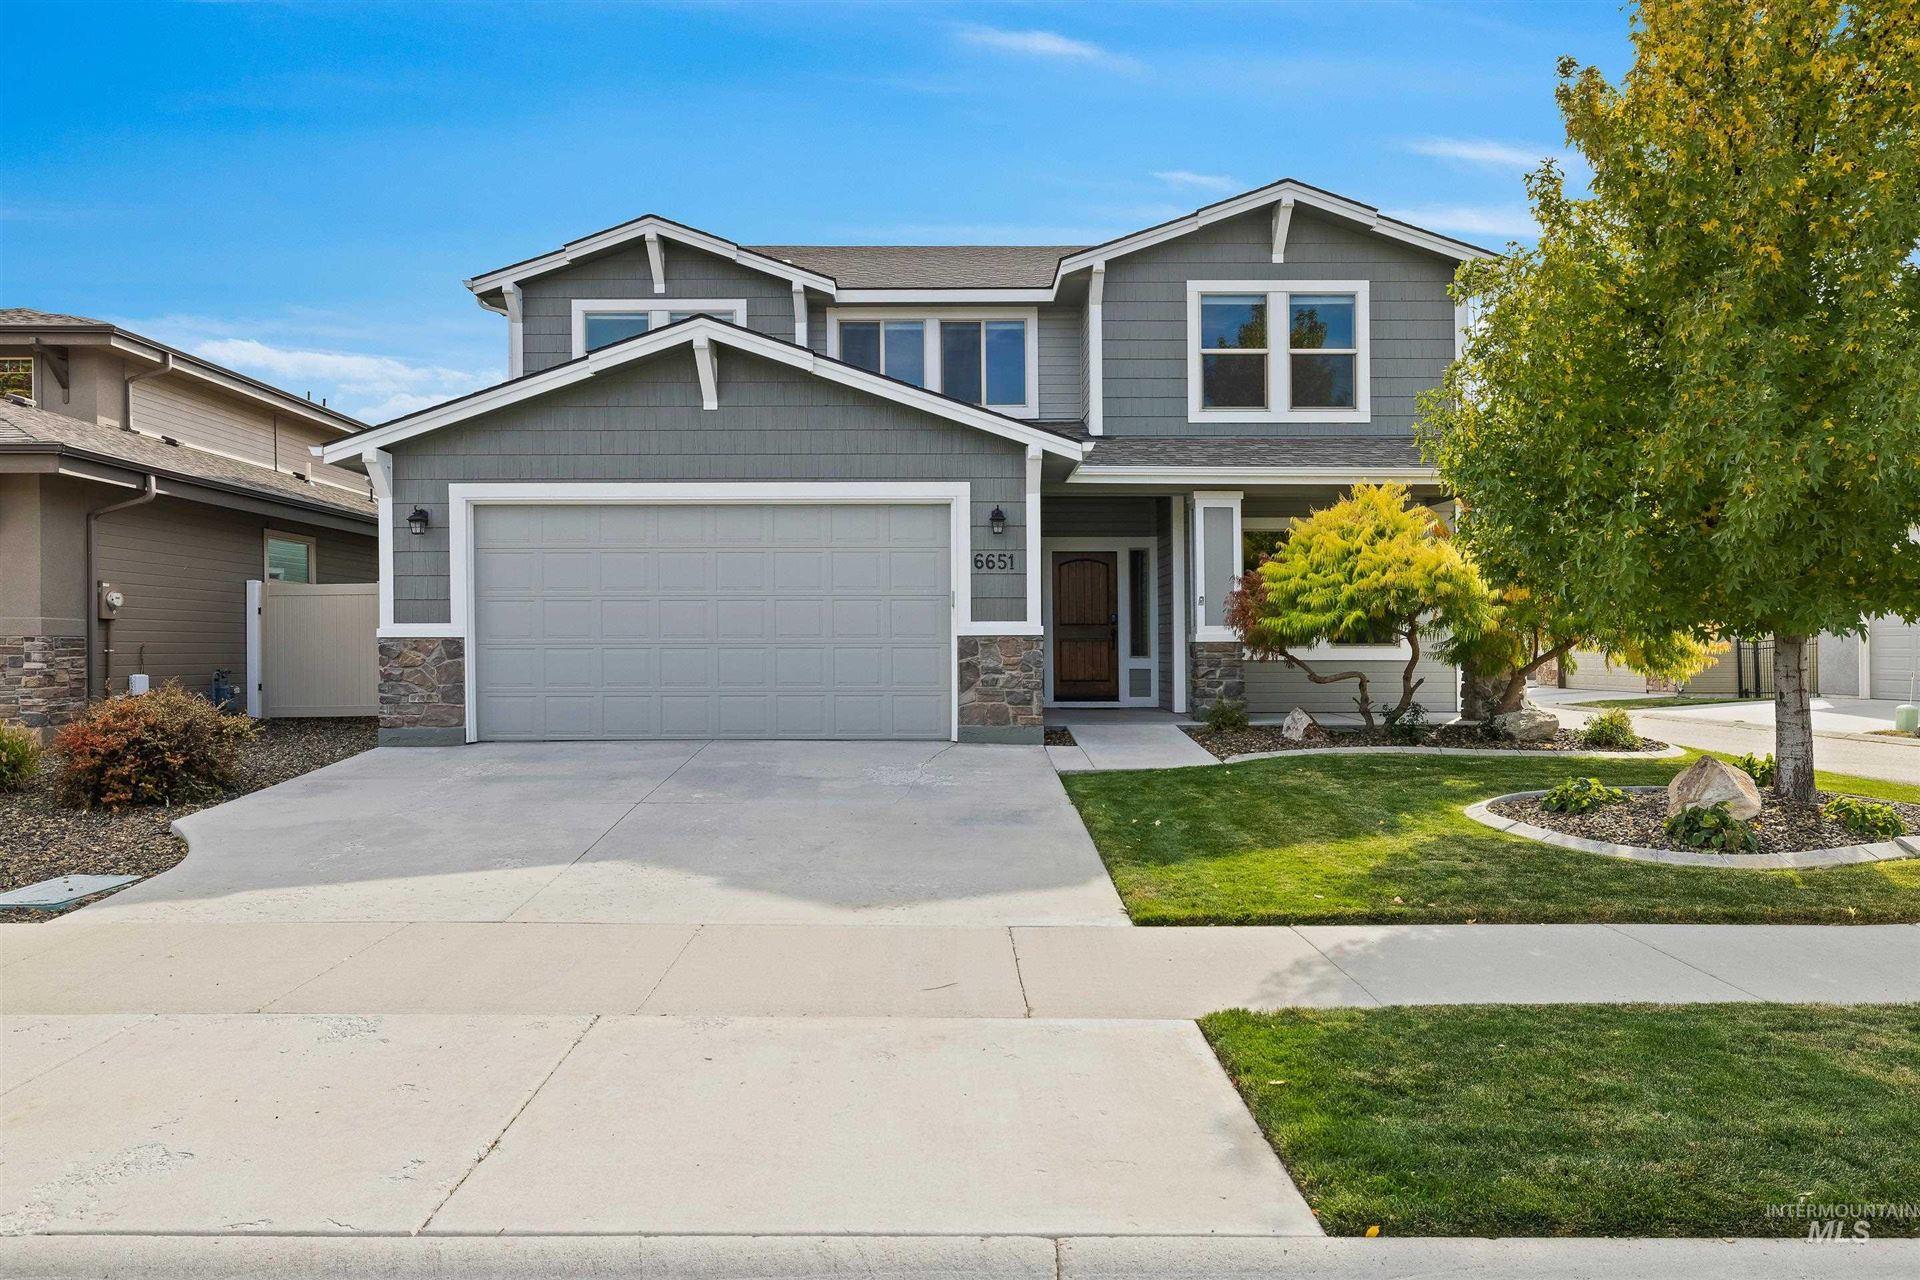 6651 E Deer Ridge, Boise, ID 83716-7118 - MLS#: 98821105